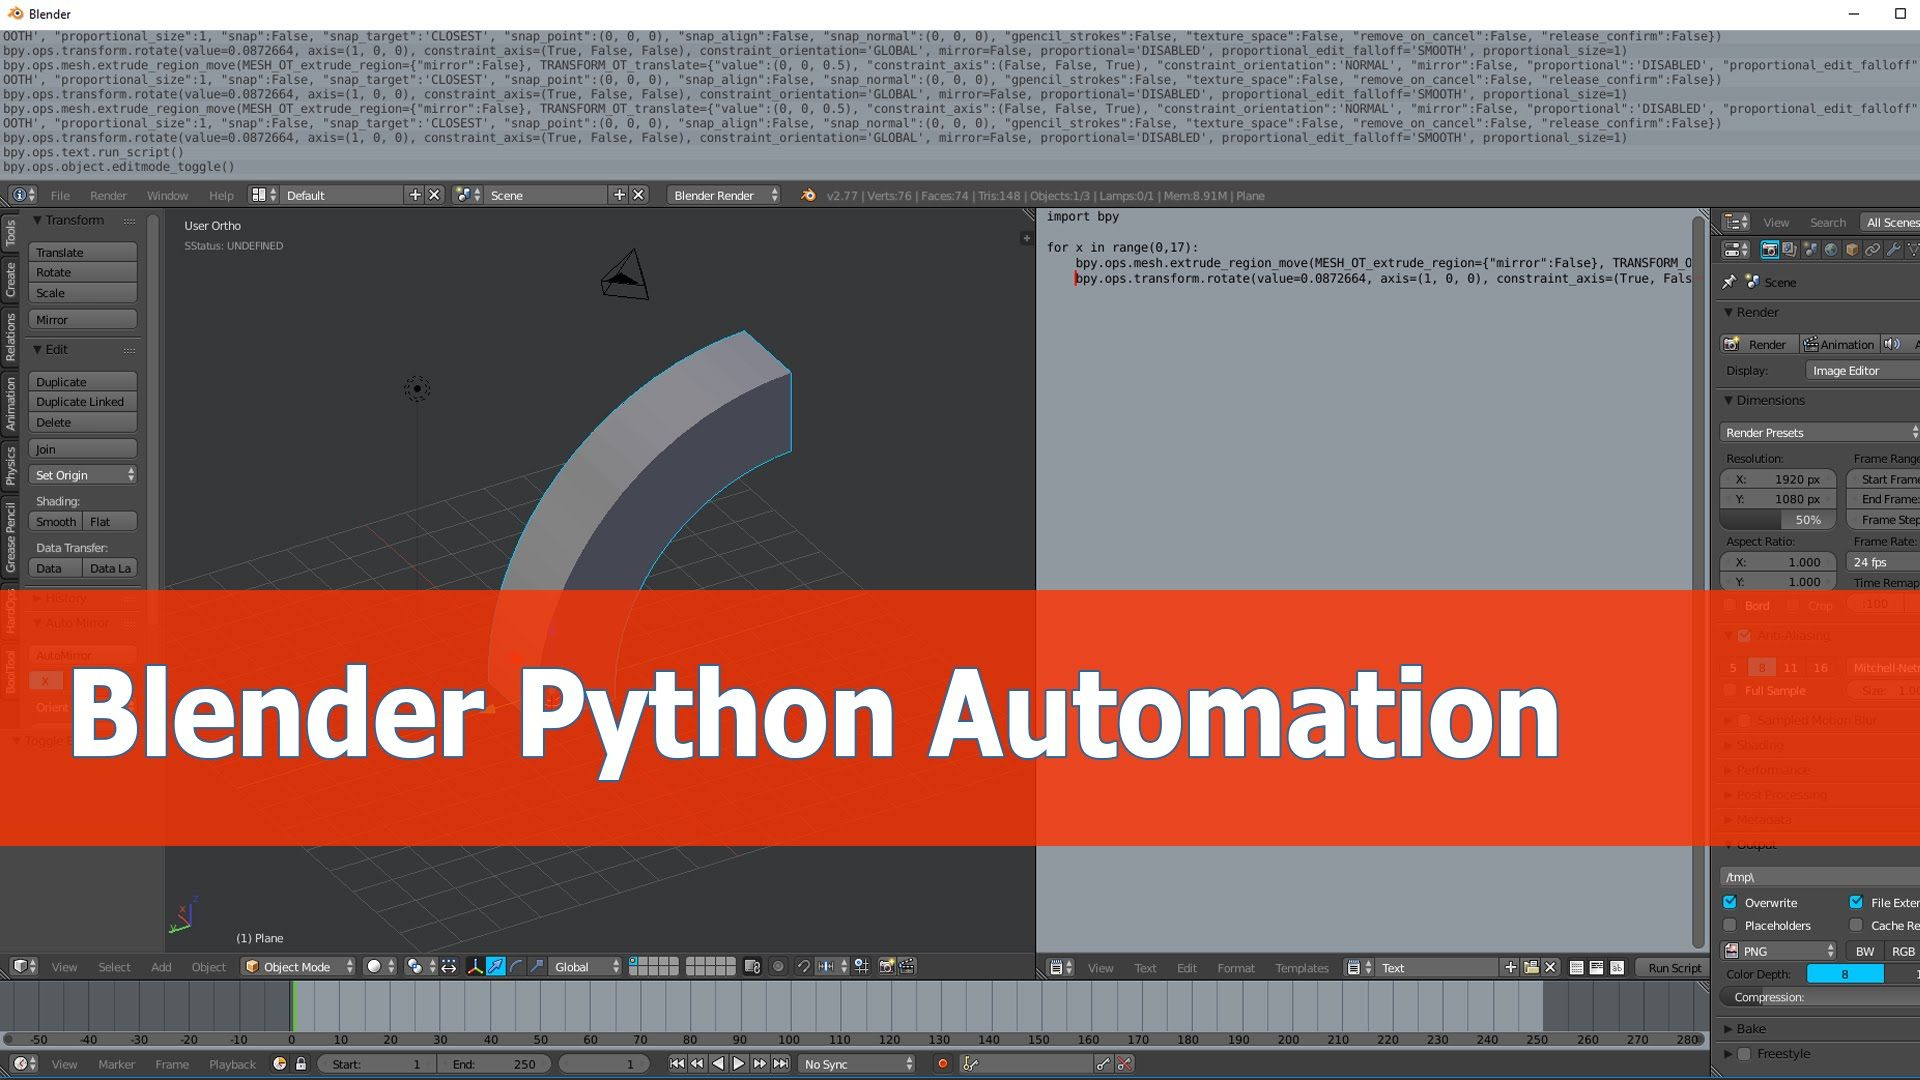 Blender Python Tutorial Automate Operations Python Blender Blender Tutorial